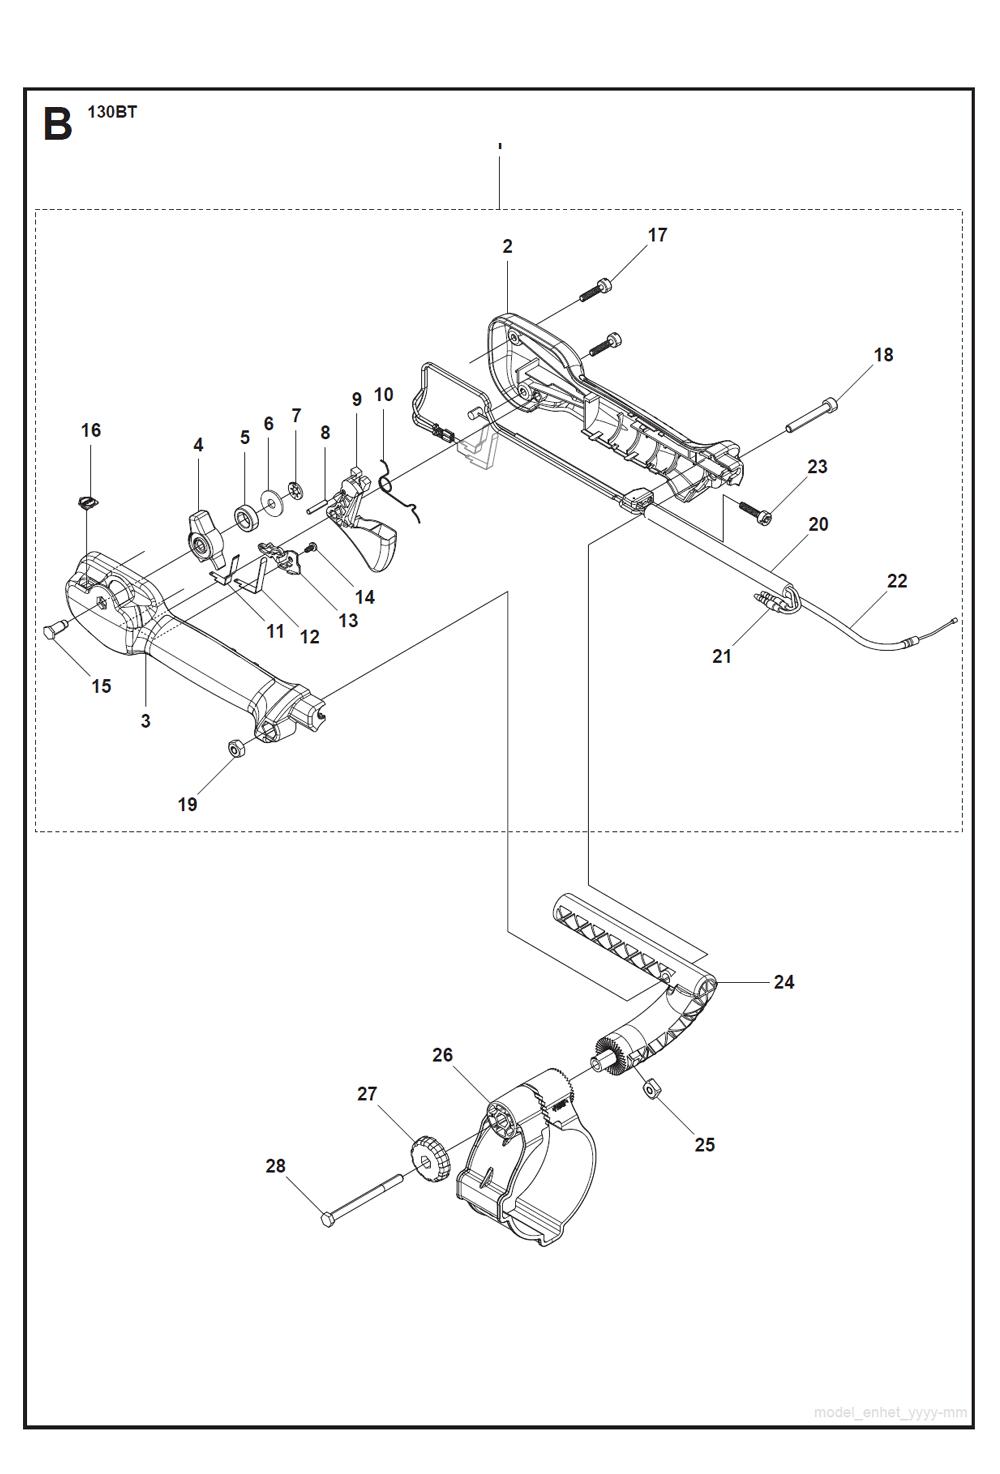 Buy Husqvarna 130BT Type-2 Replacement Tool Parts